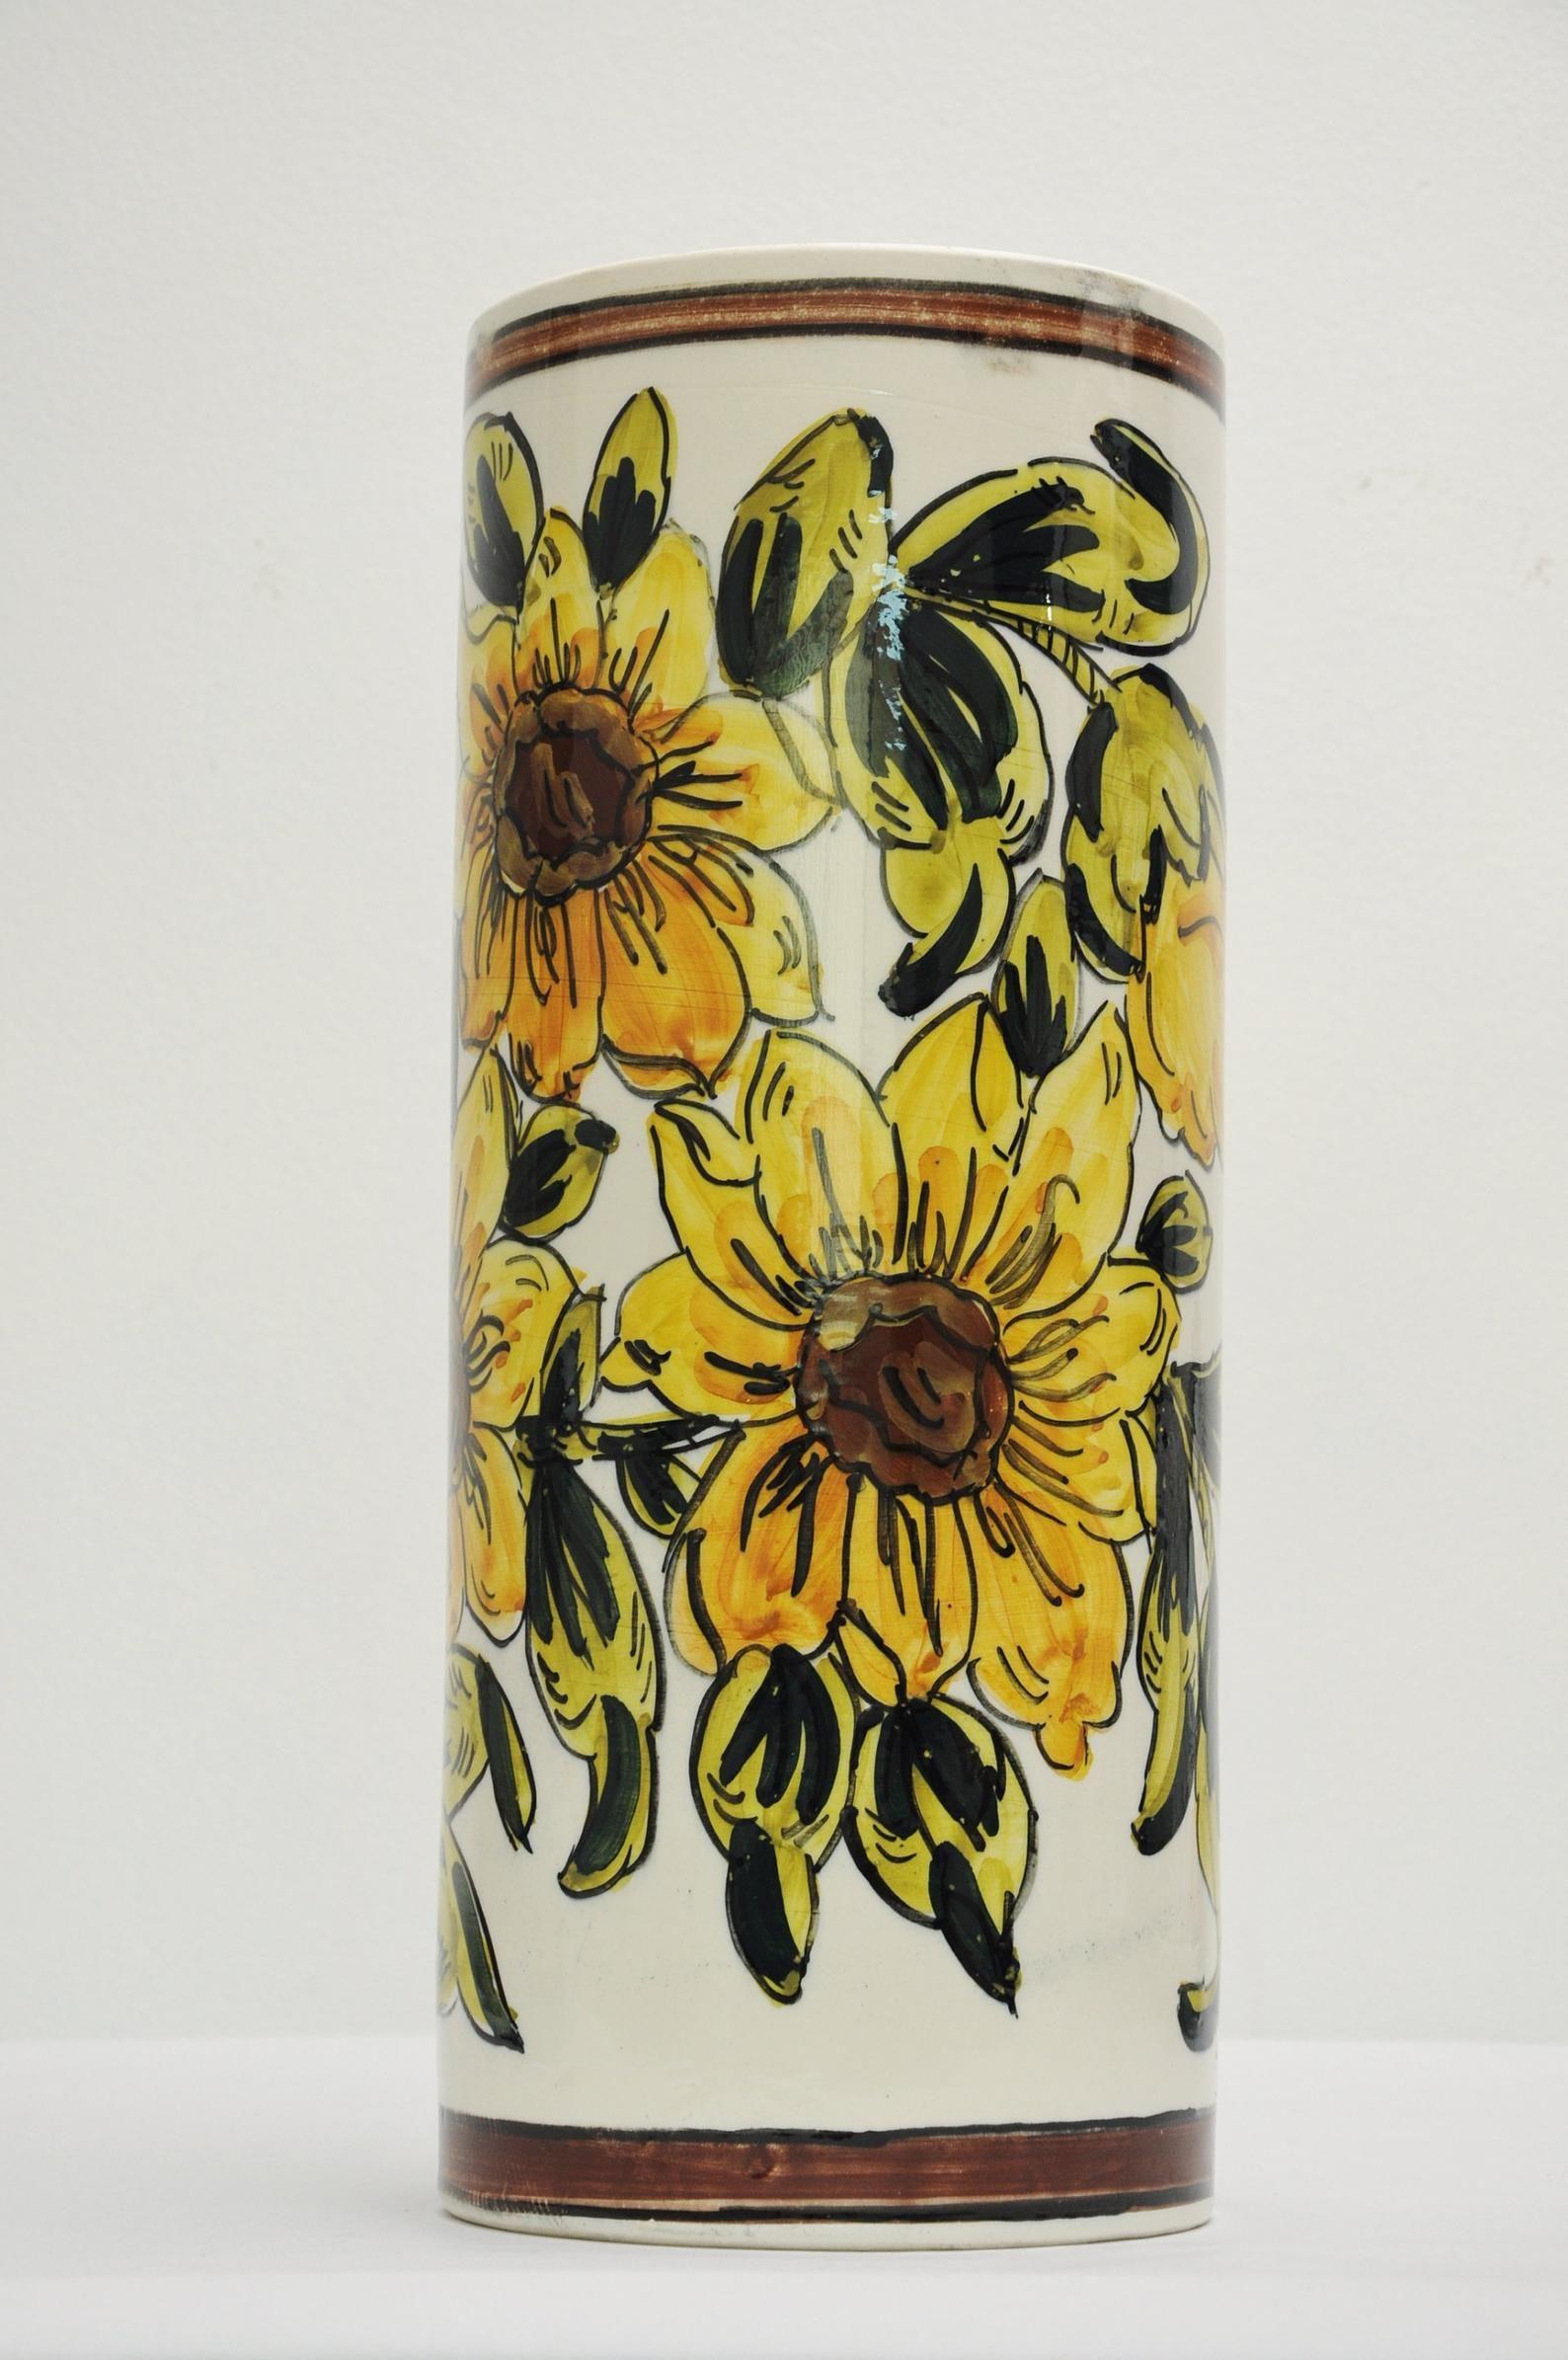 Vtg Spanish Ceramic Umbrella Stand Floral Yellow Flowers Etsy Hand Painted Flowers Umbrella Stand Yellow Flowers